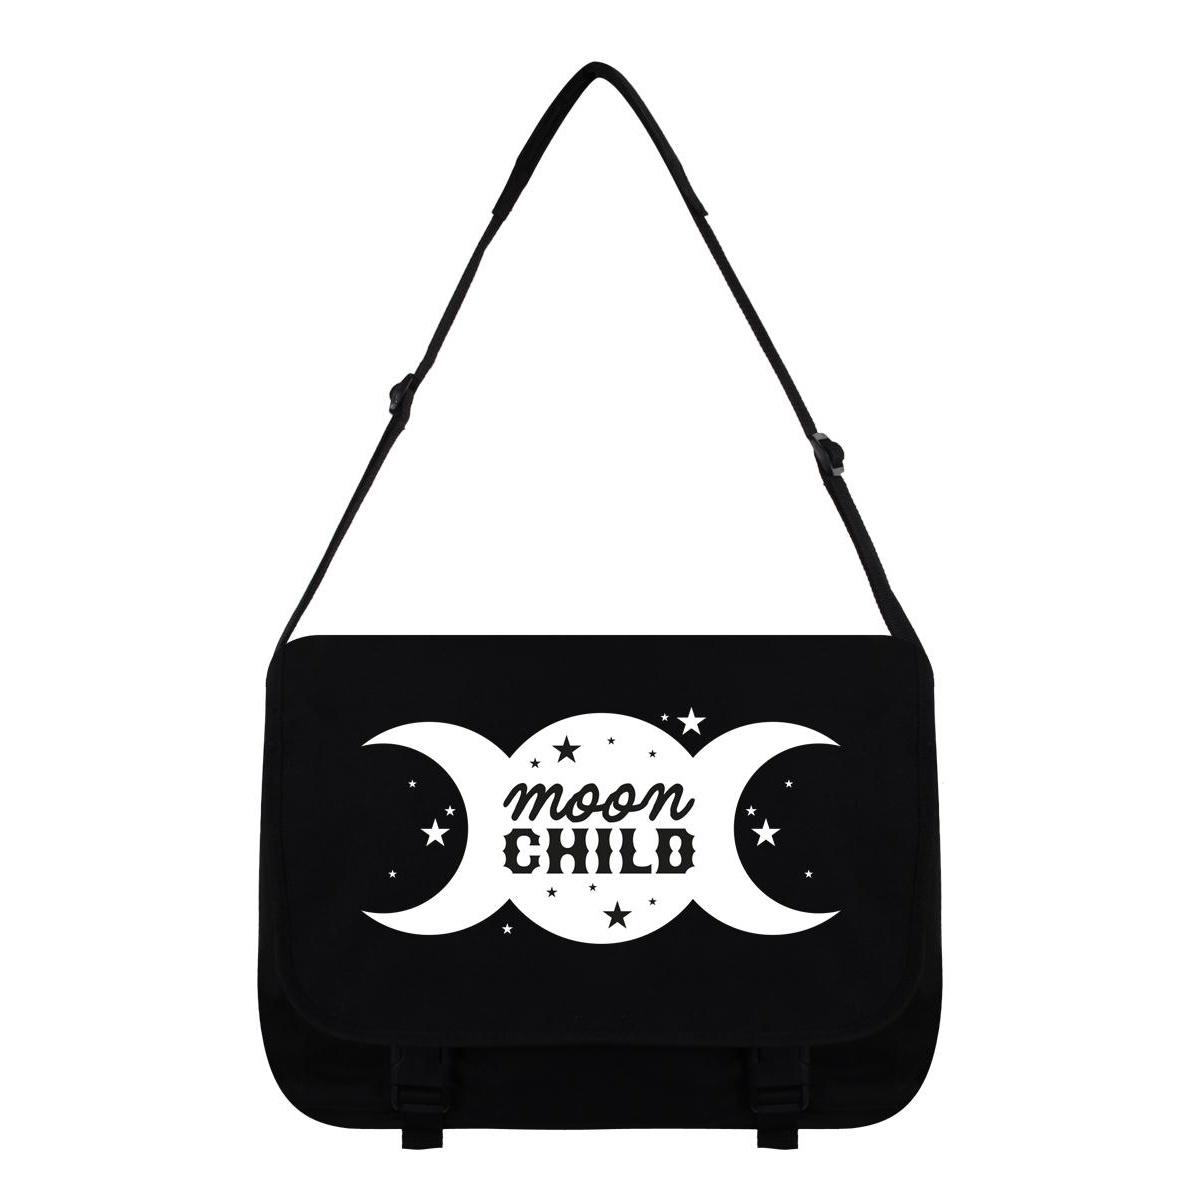 Grindstore Moon Child Messenger Bag (One Size) (Black/White)